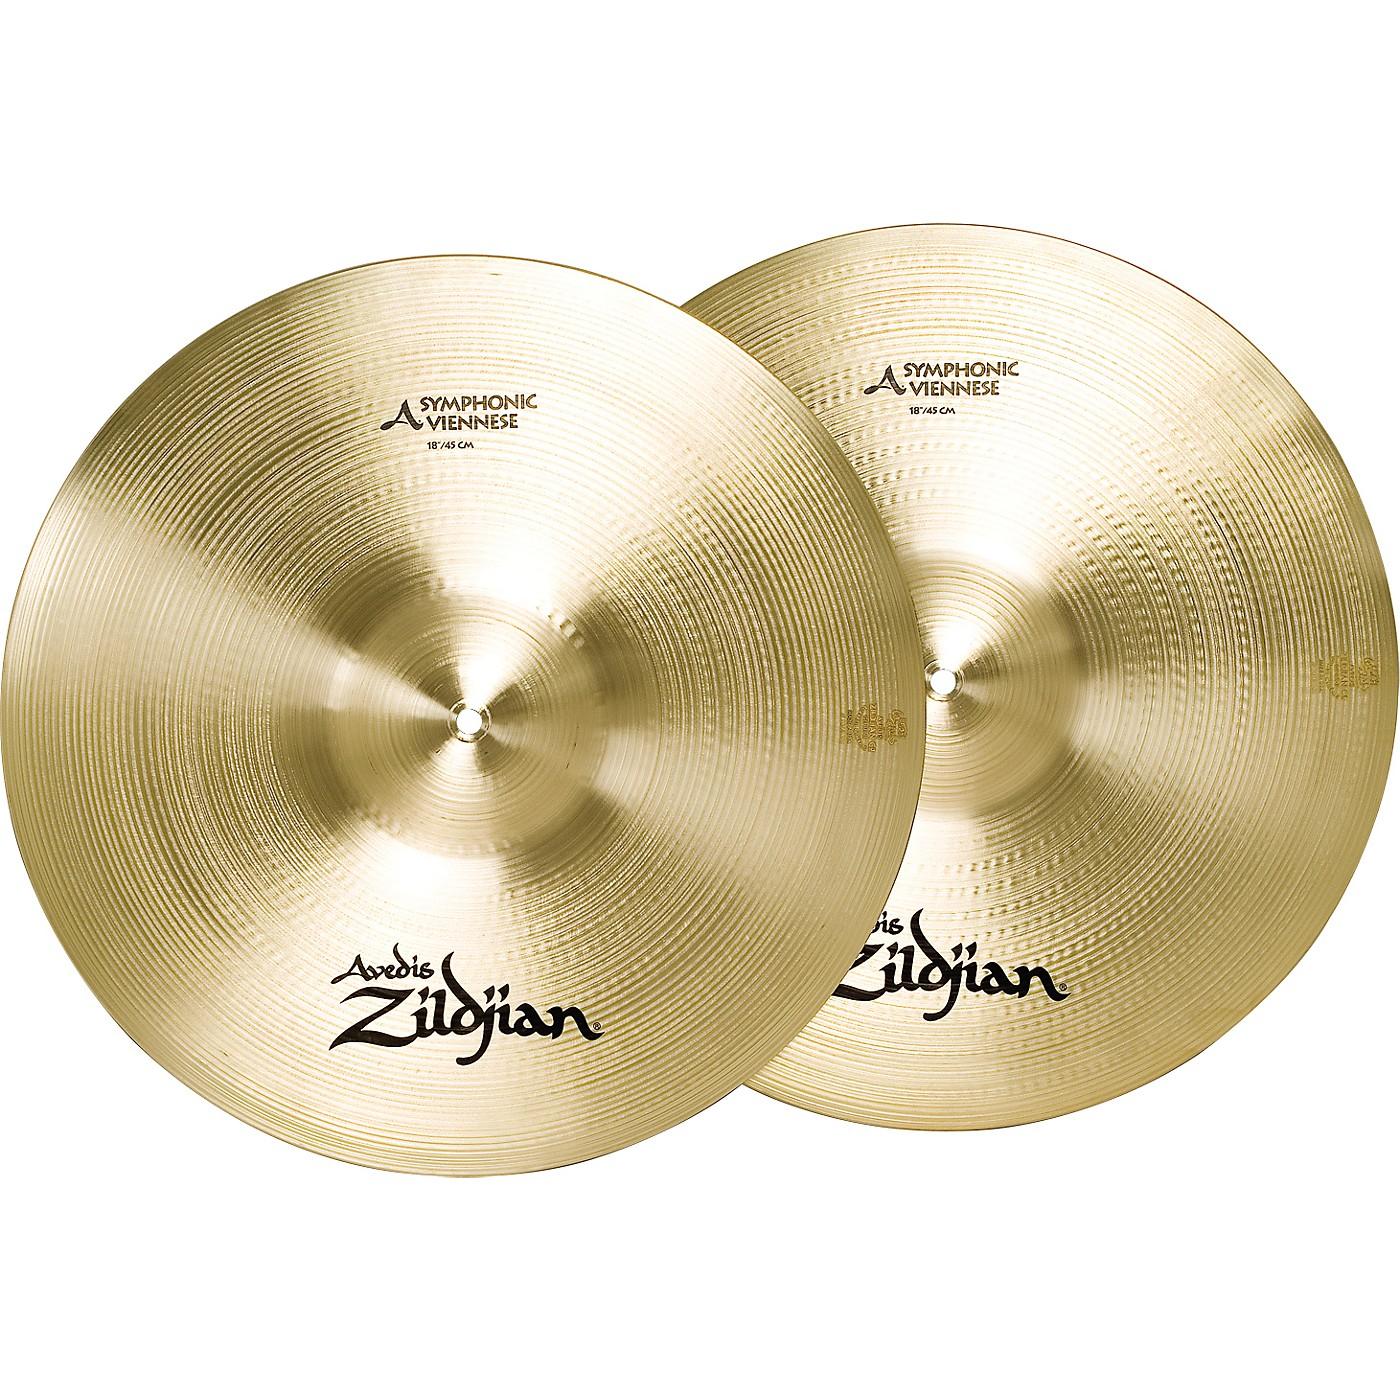 Zildjian A Symphonic Viennese Tone Crash Cymbal Pair thumbnail